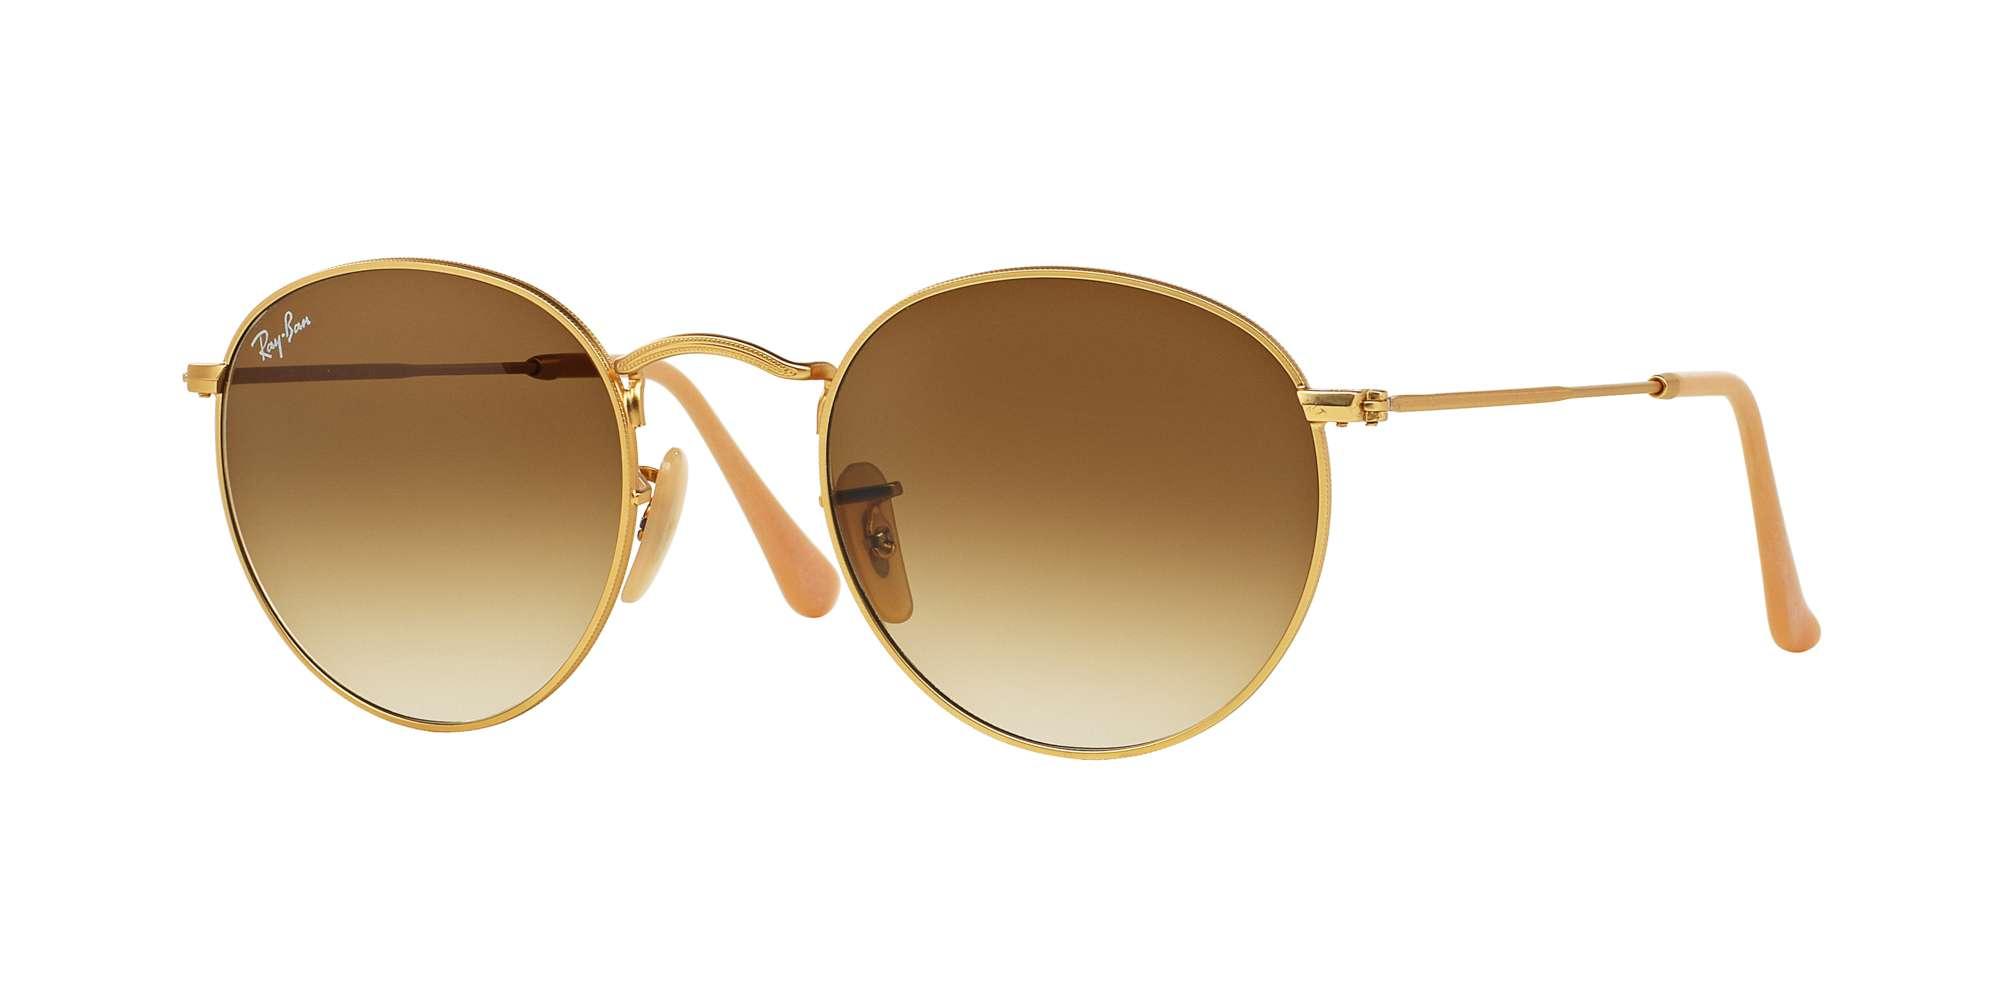 MATTE GOLD / CLEAR GRADIENT BROWN lenses